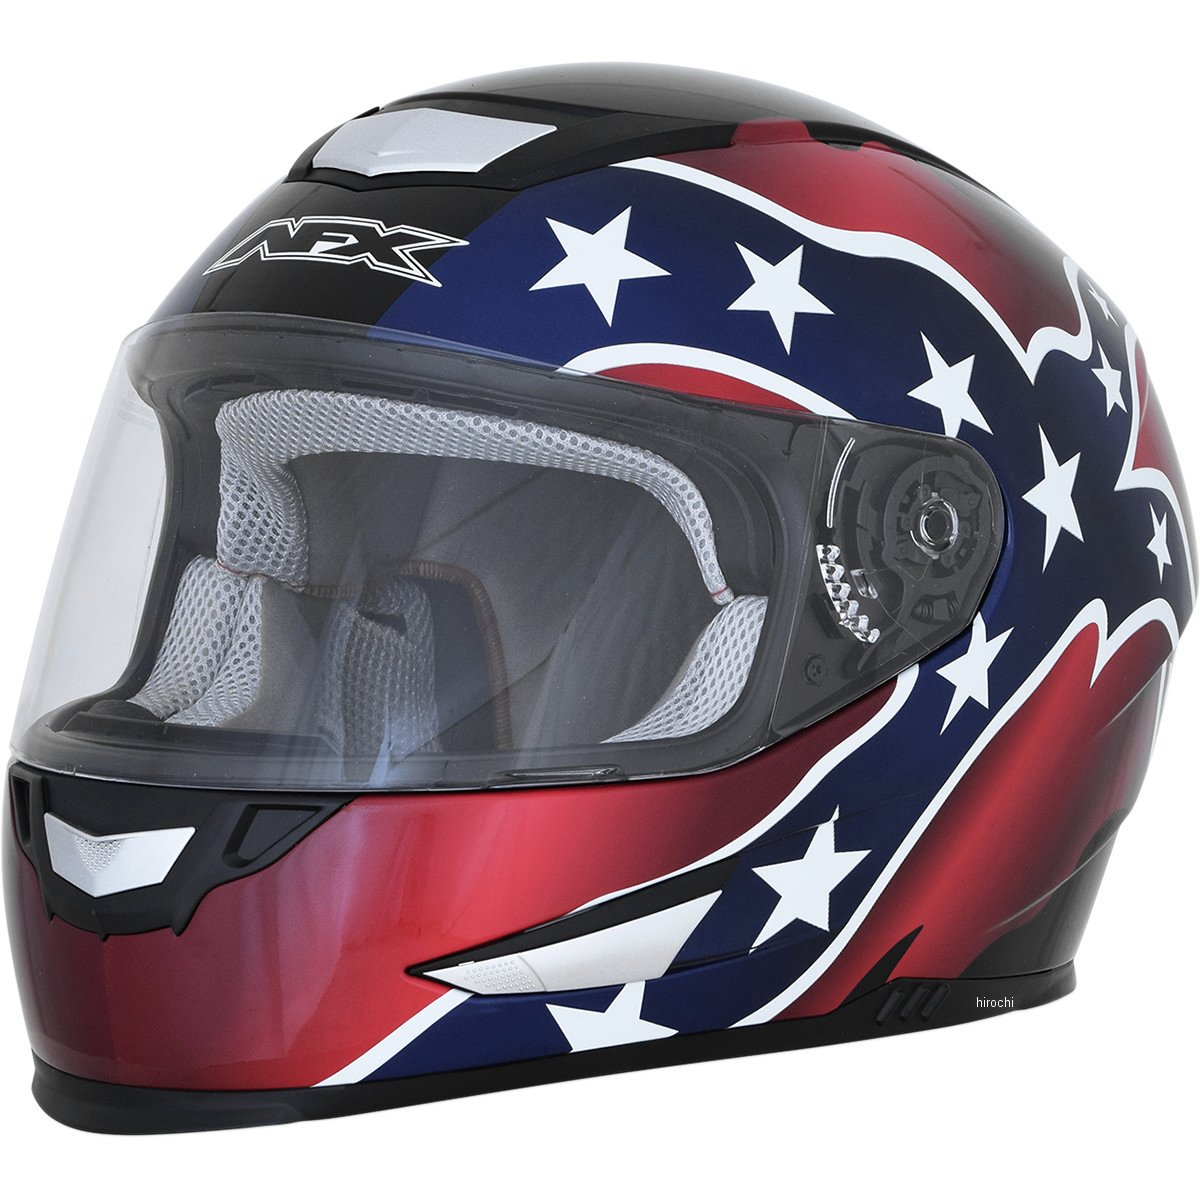 【USA在庫あり】 AFX フルフェイスヘルメット FX-99 黒レベル(つや有り) XXLサイズ (63cm-64cm) 0101-11375 JP店